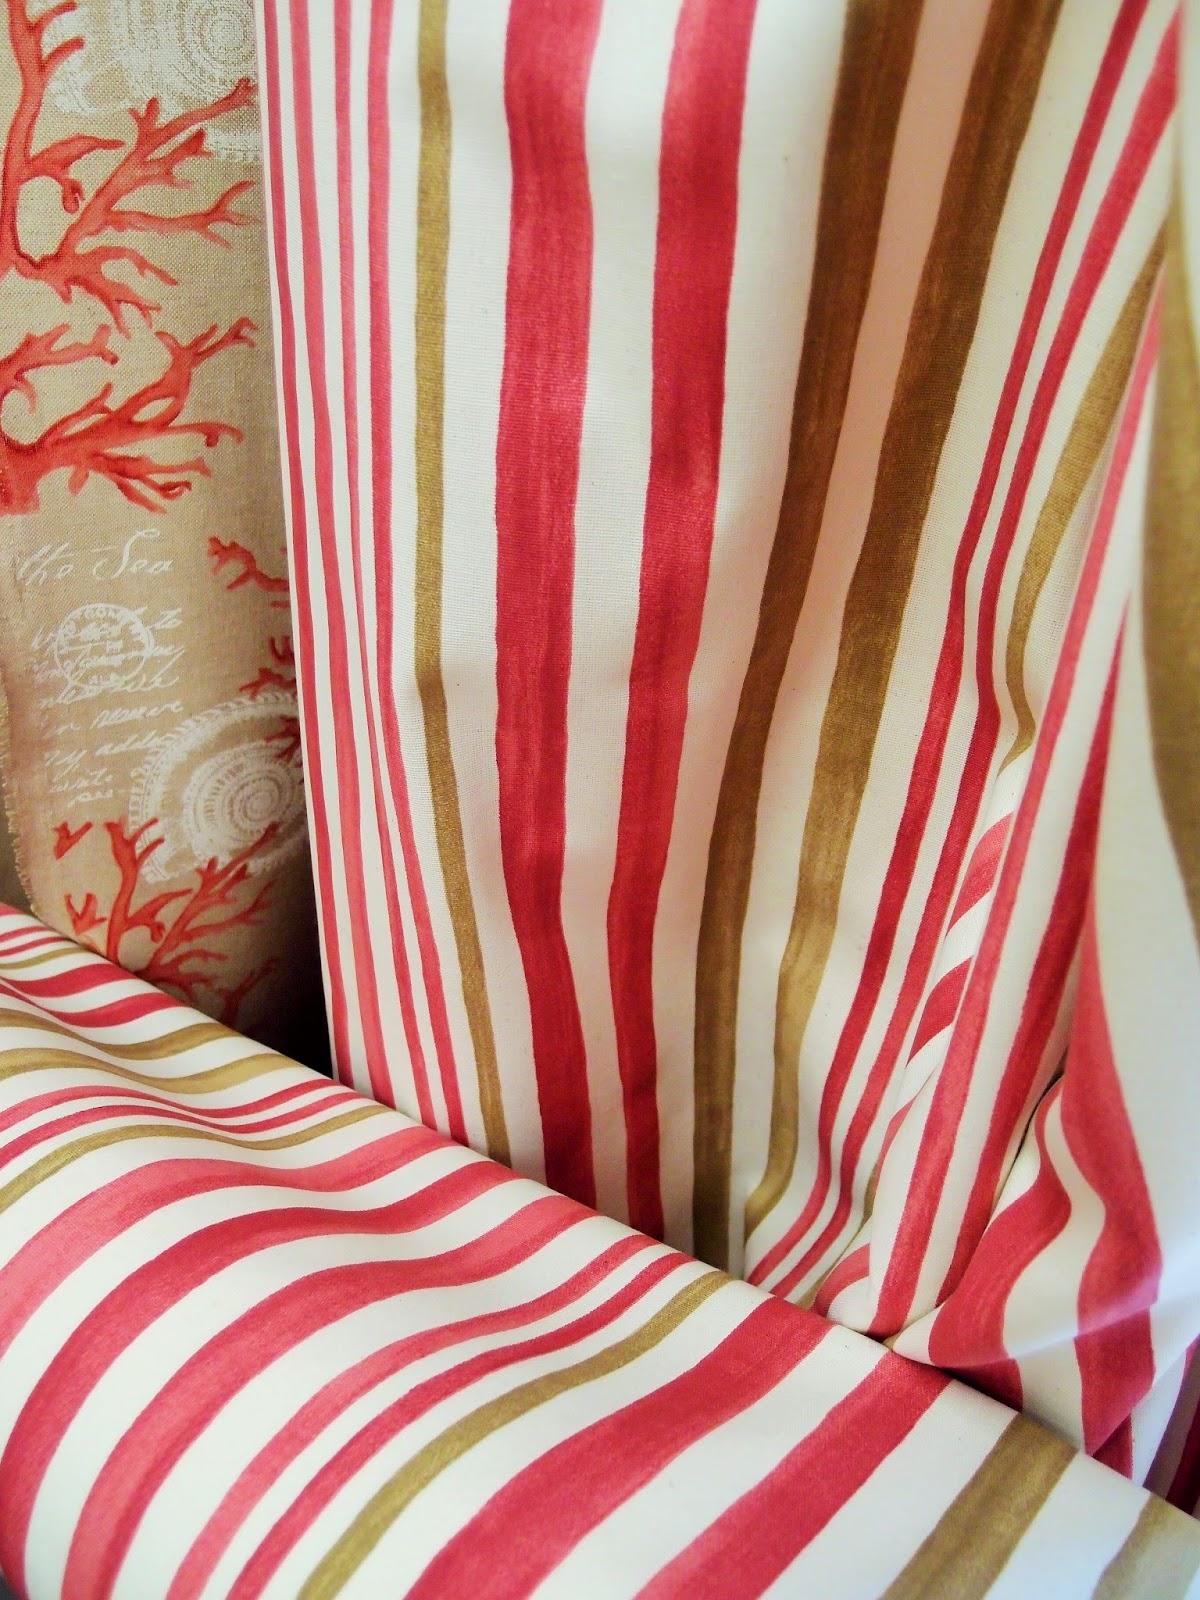 Tessuti per arredare antichit bellini for Tessuti arredamento francesi